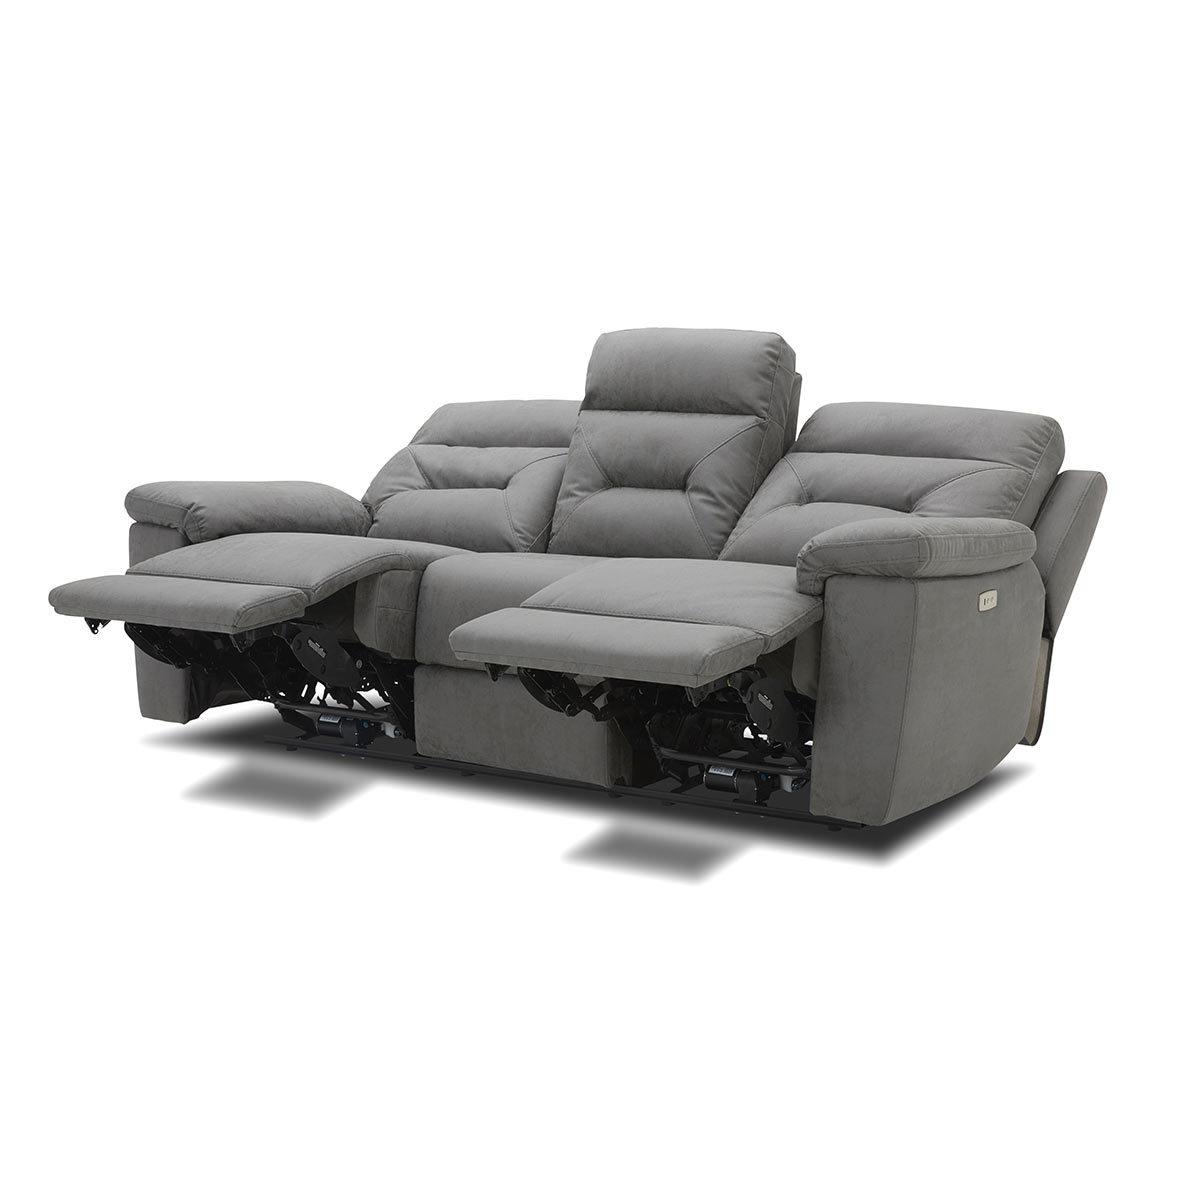 Raven Power Reclining Sofas Regarding Well Known Kuka Justin Grey Fabric Power Reclining 3 Seater Sofa (View 3 of 20)